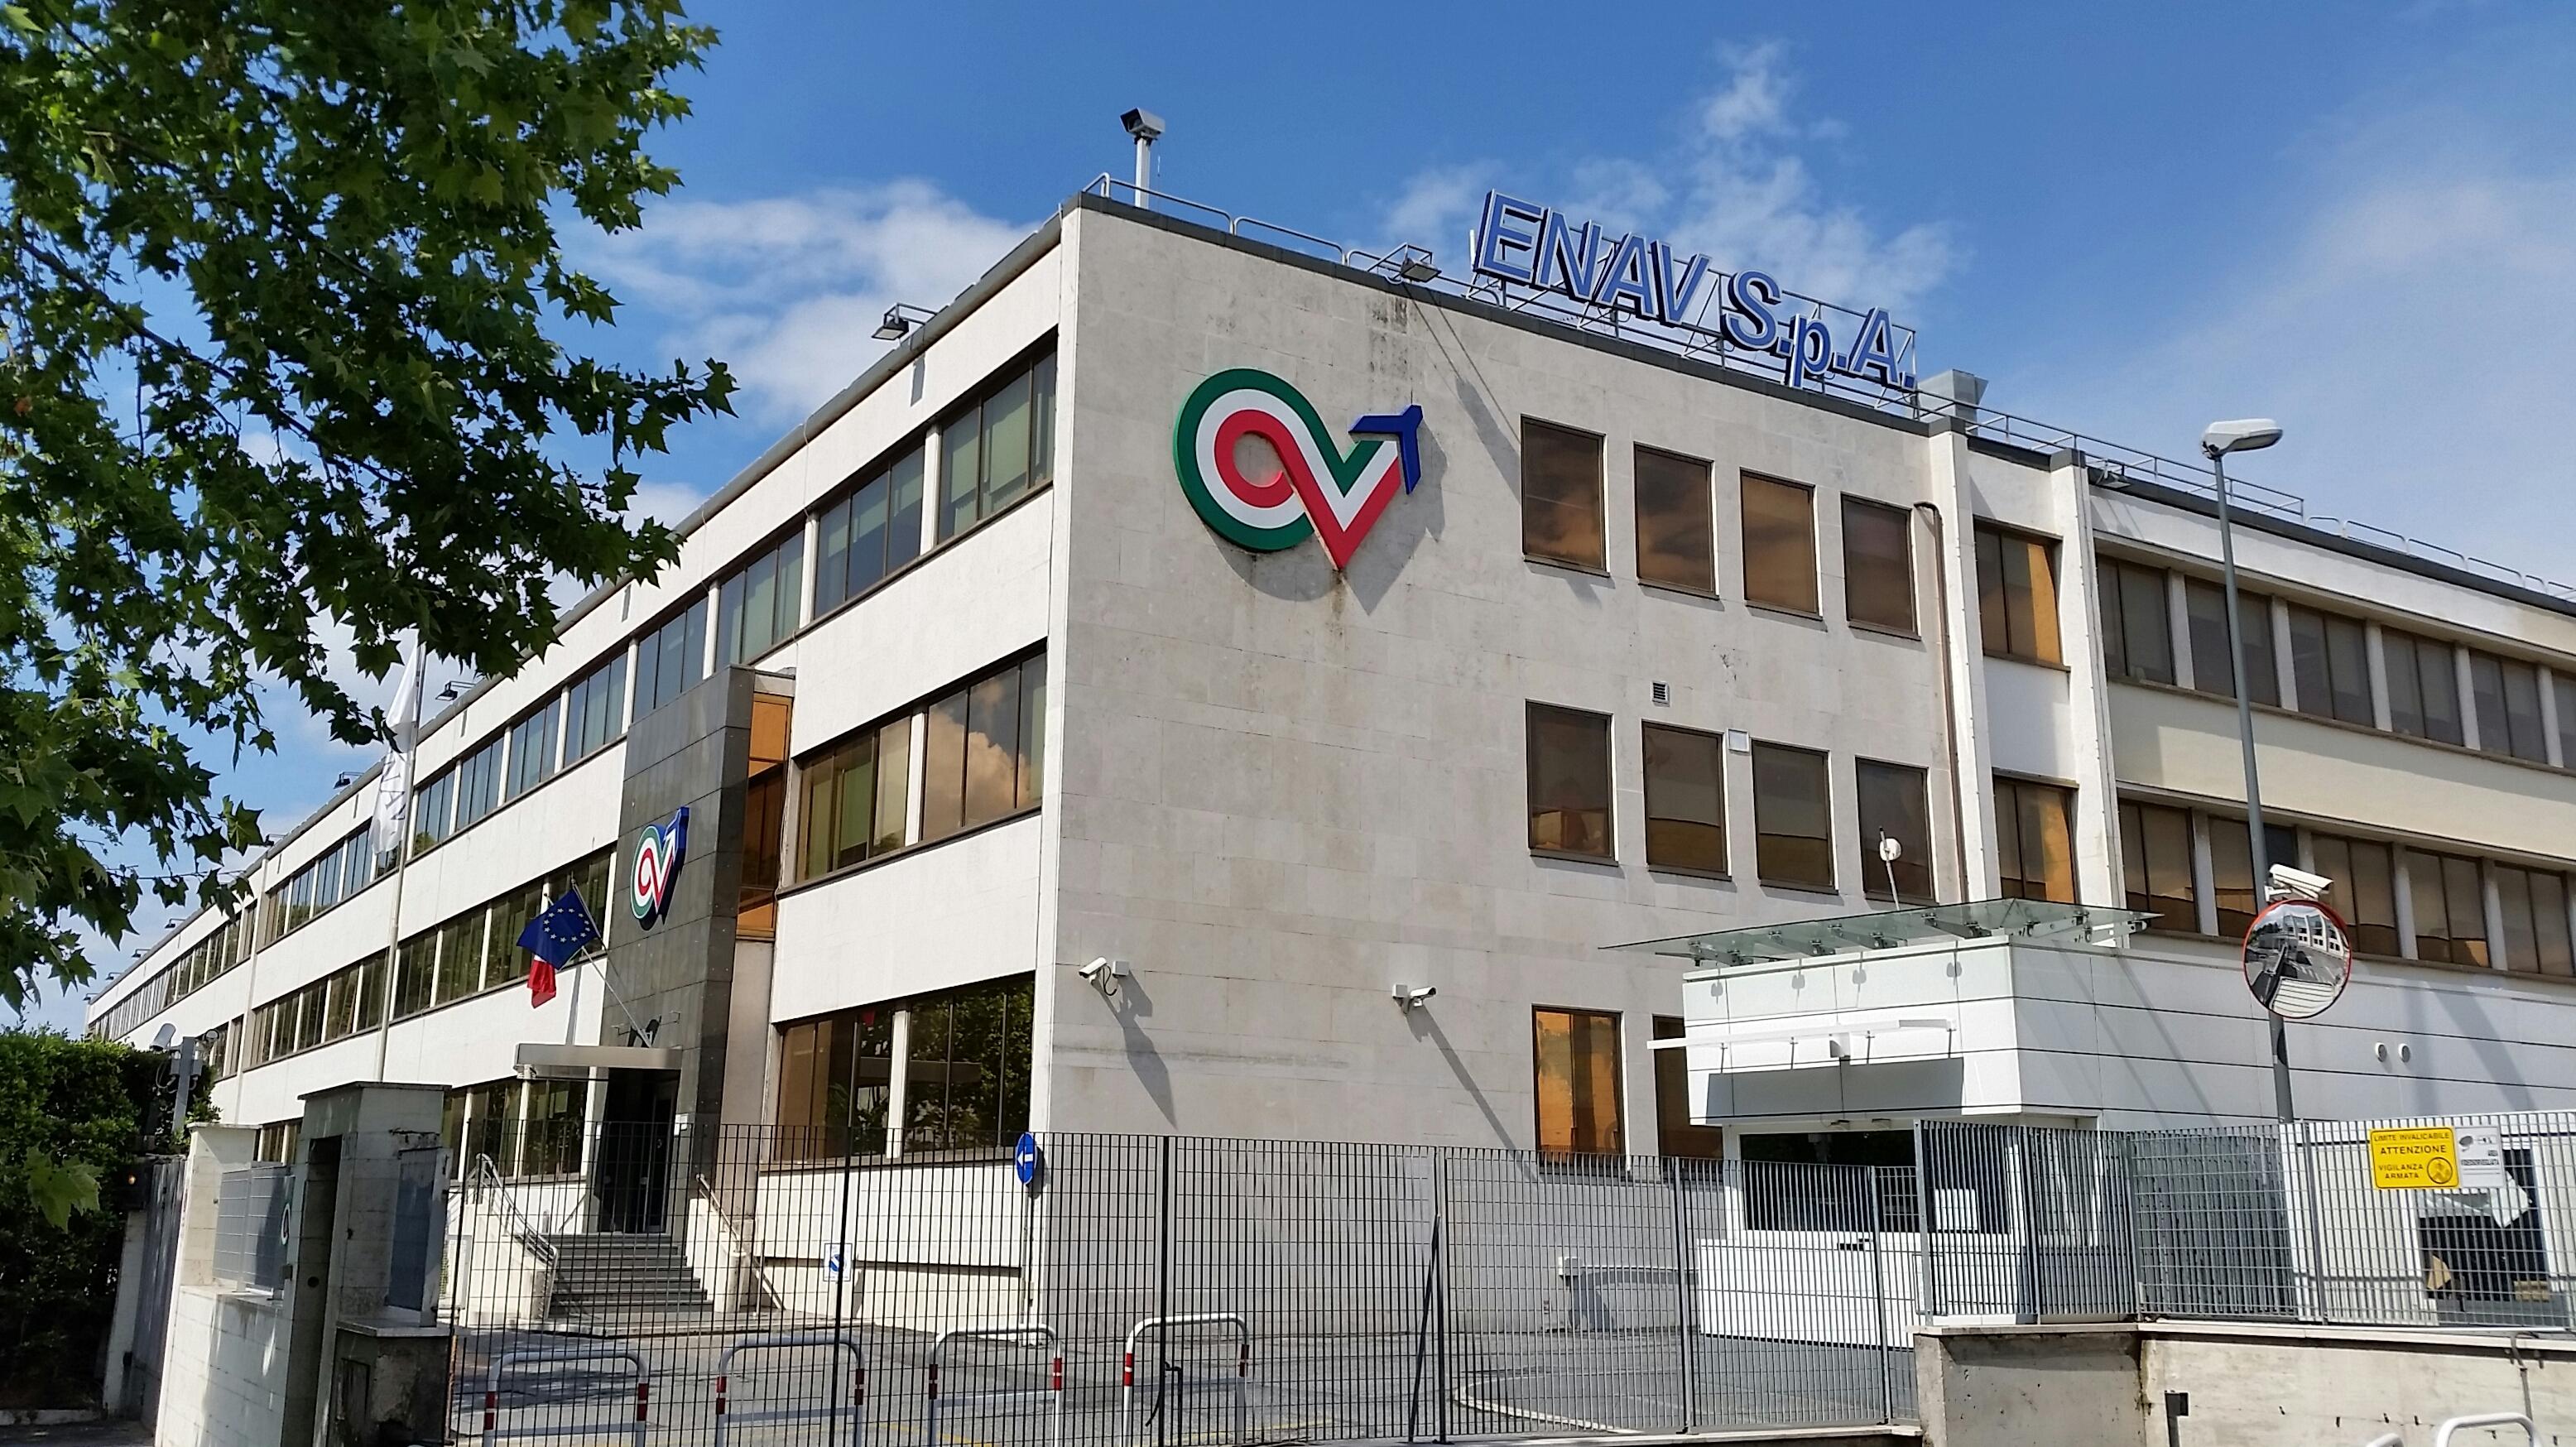 File sede enav via salaria wikimedia commons for Sede parlamento roma